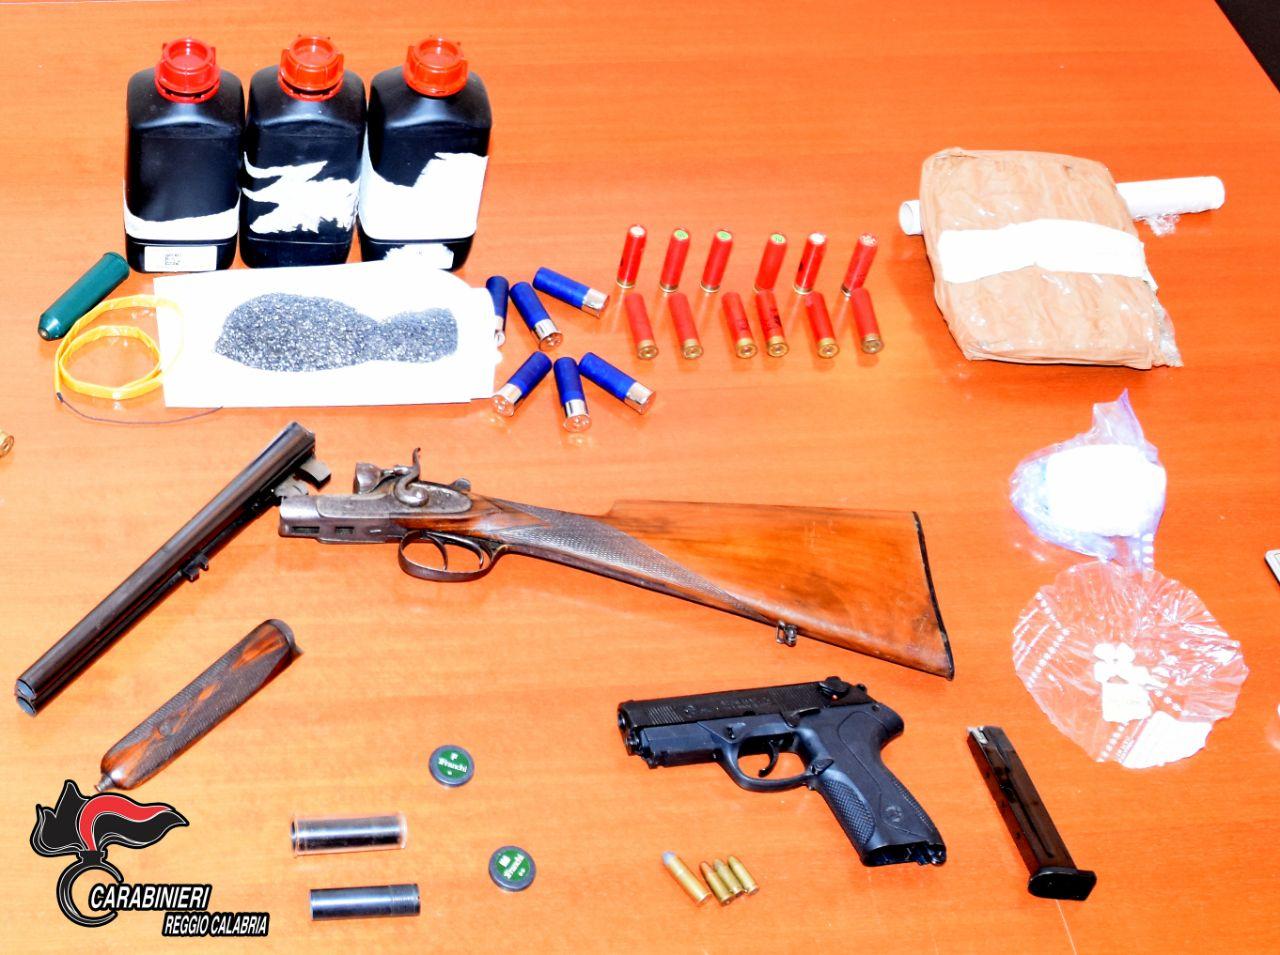 armi, droga, carabinieri